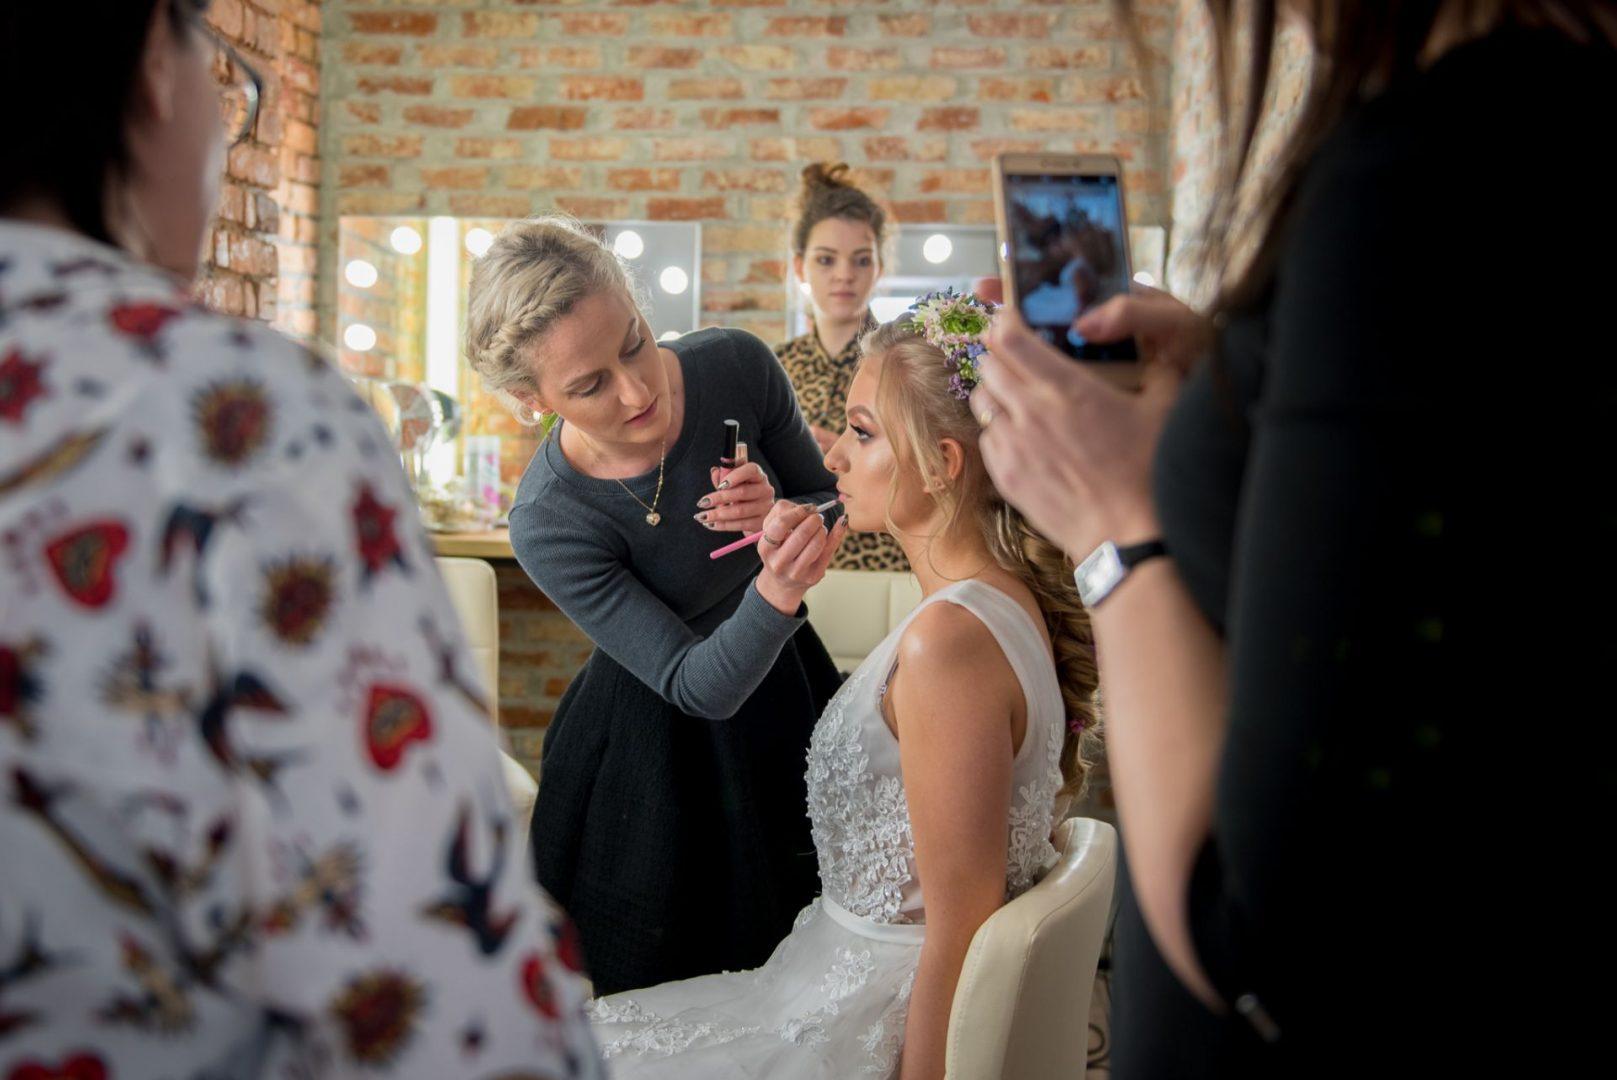 Kursy Makijażu - Karolina Kuklińska Makeup Artist, Szczecin